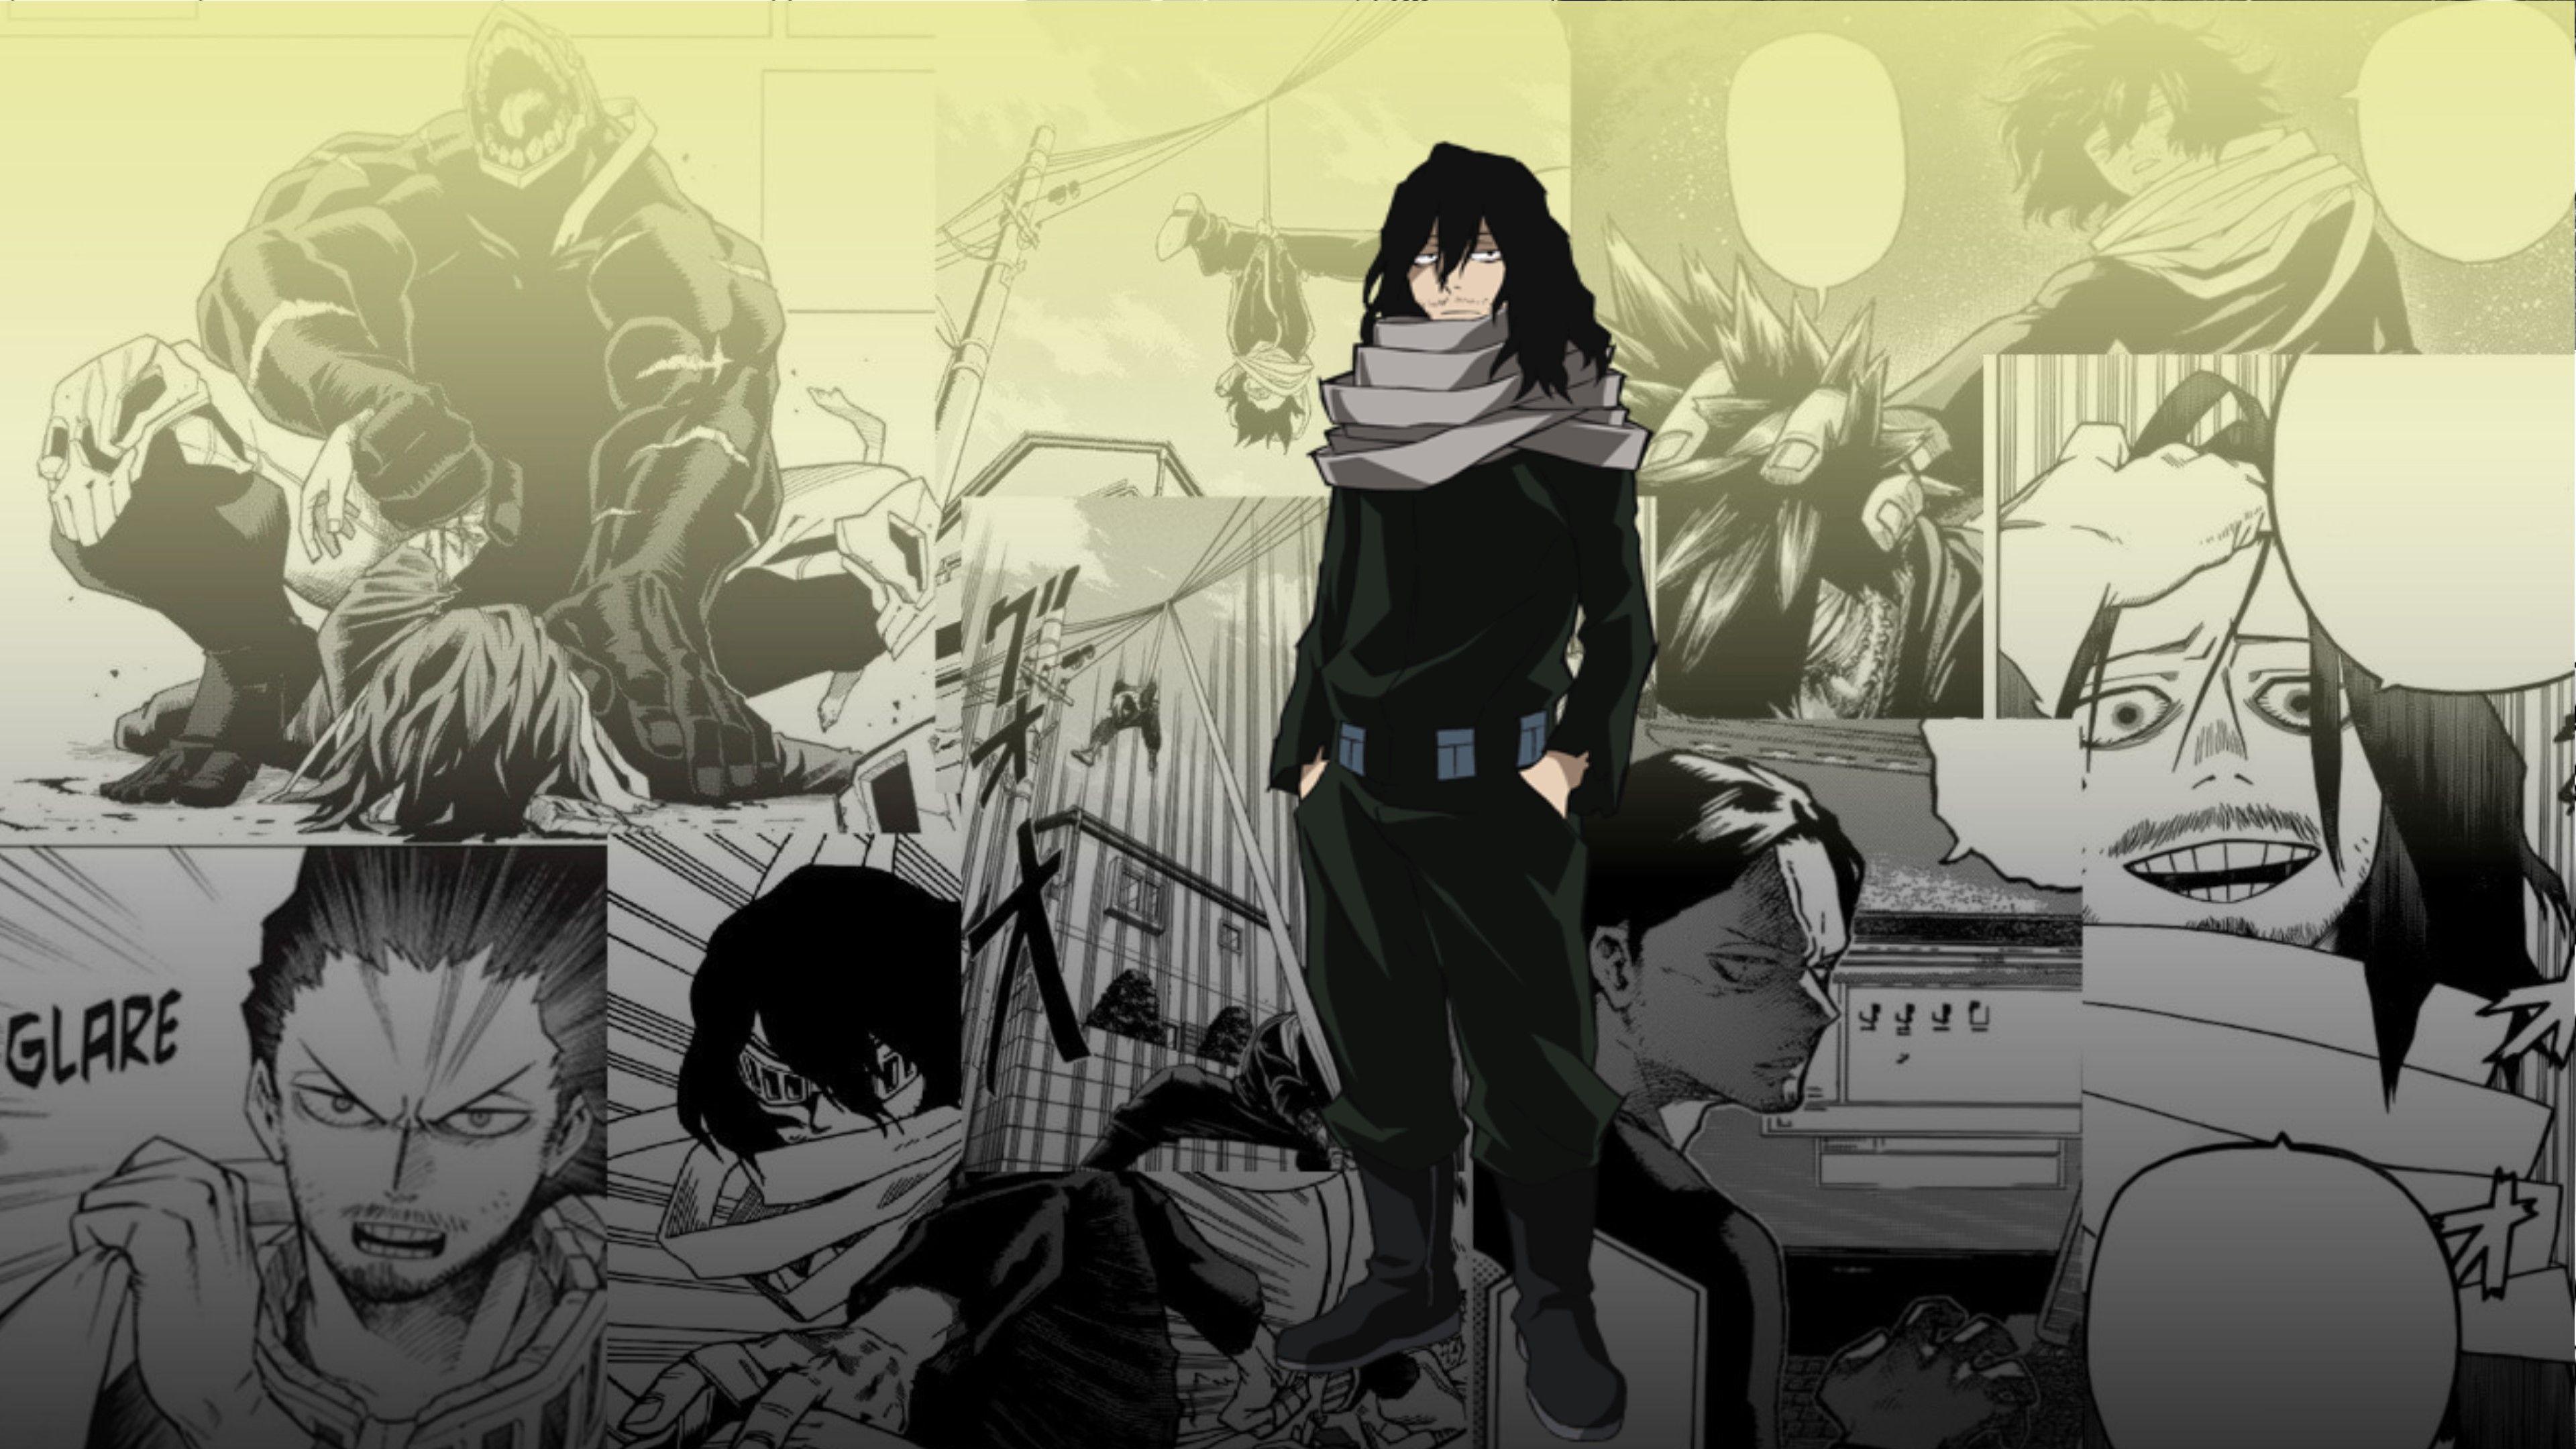 Anime MHA Computer Wallpapers - Wallpaper Cave